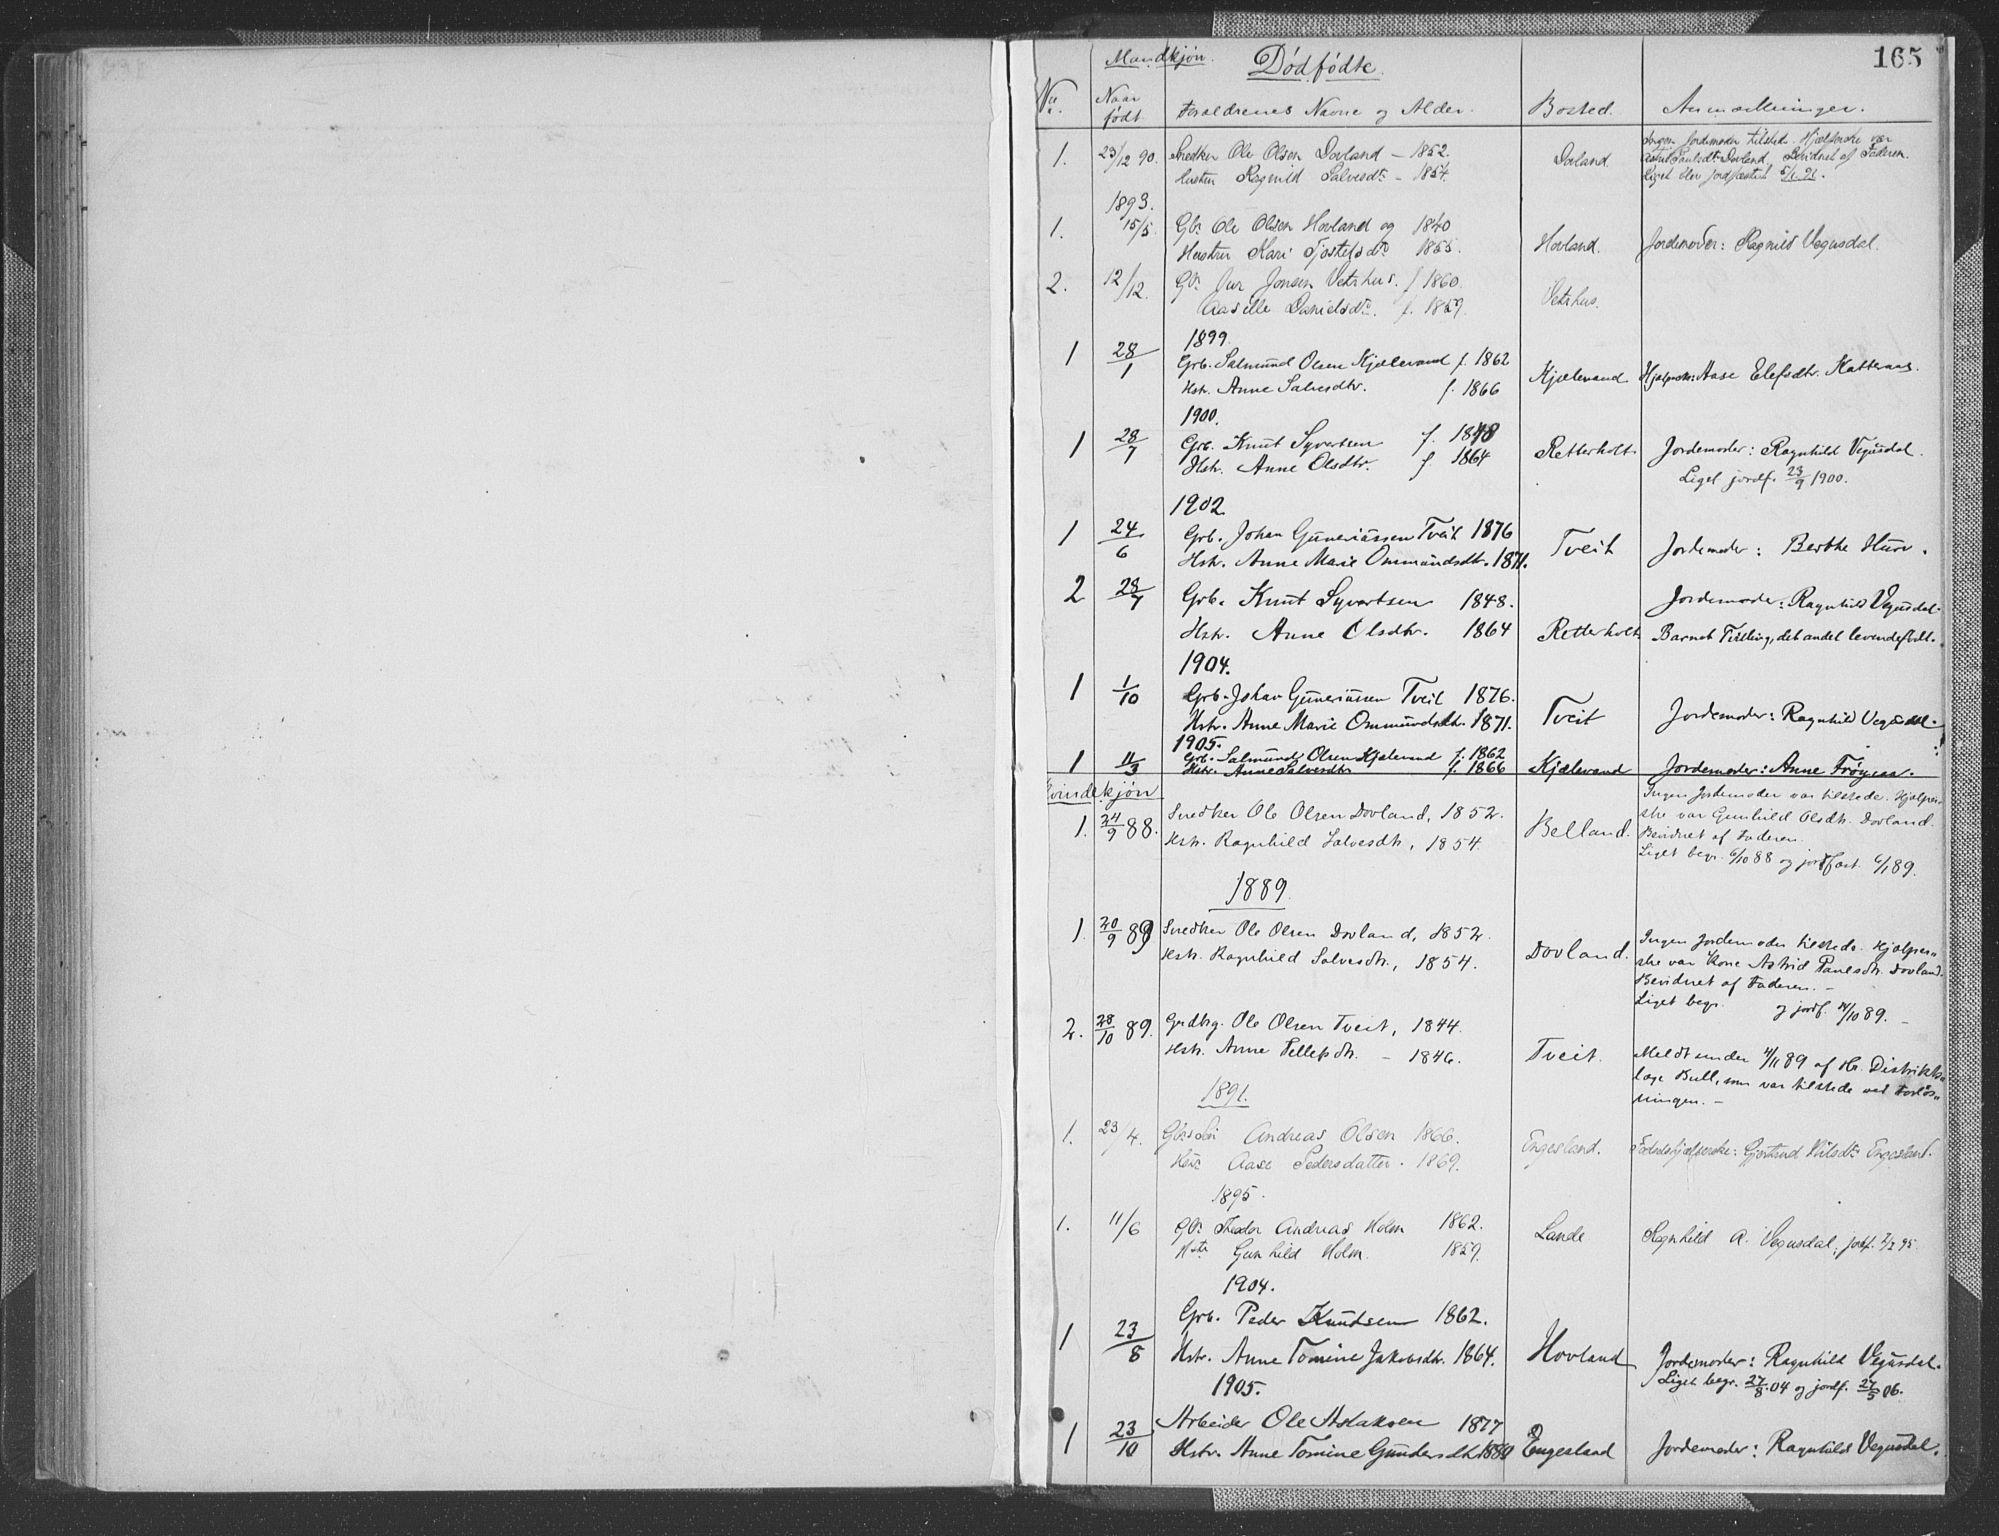 SAK, Herefoss sokneprestkontor, F/Fa/Fab/L0004: Parish register (official) no. A 4, 1887-1909, p. 165